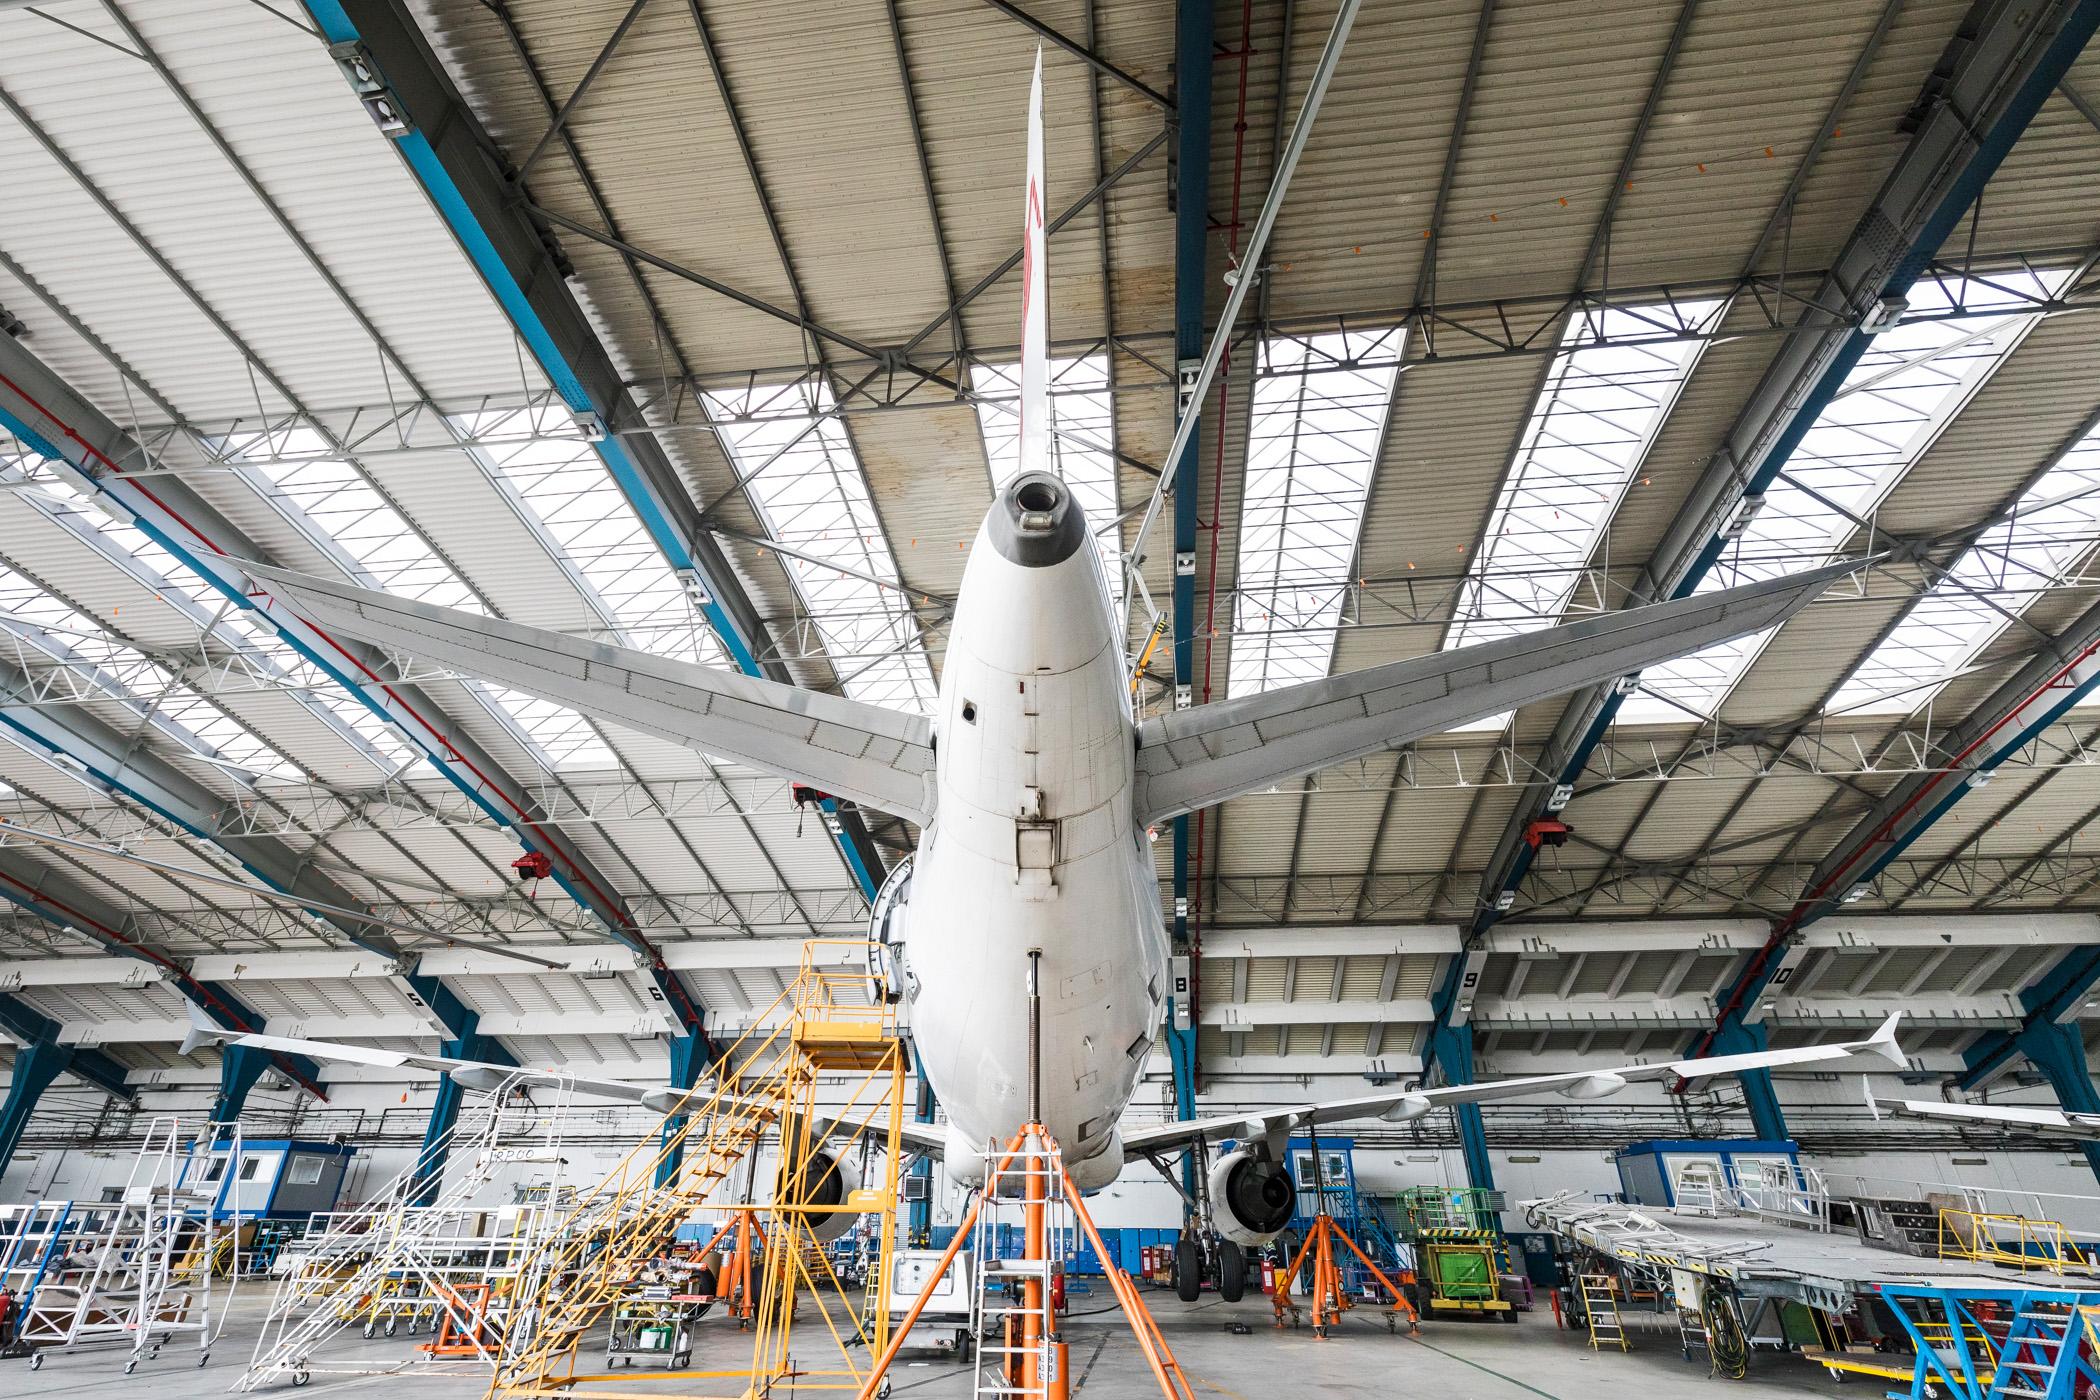 Czech Airlines Technics expands aircraft service range